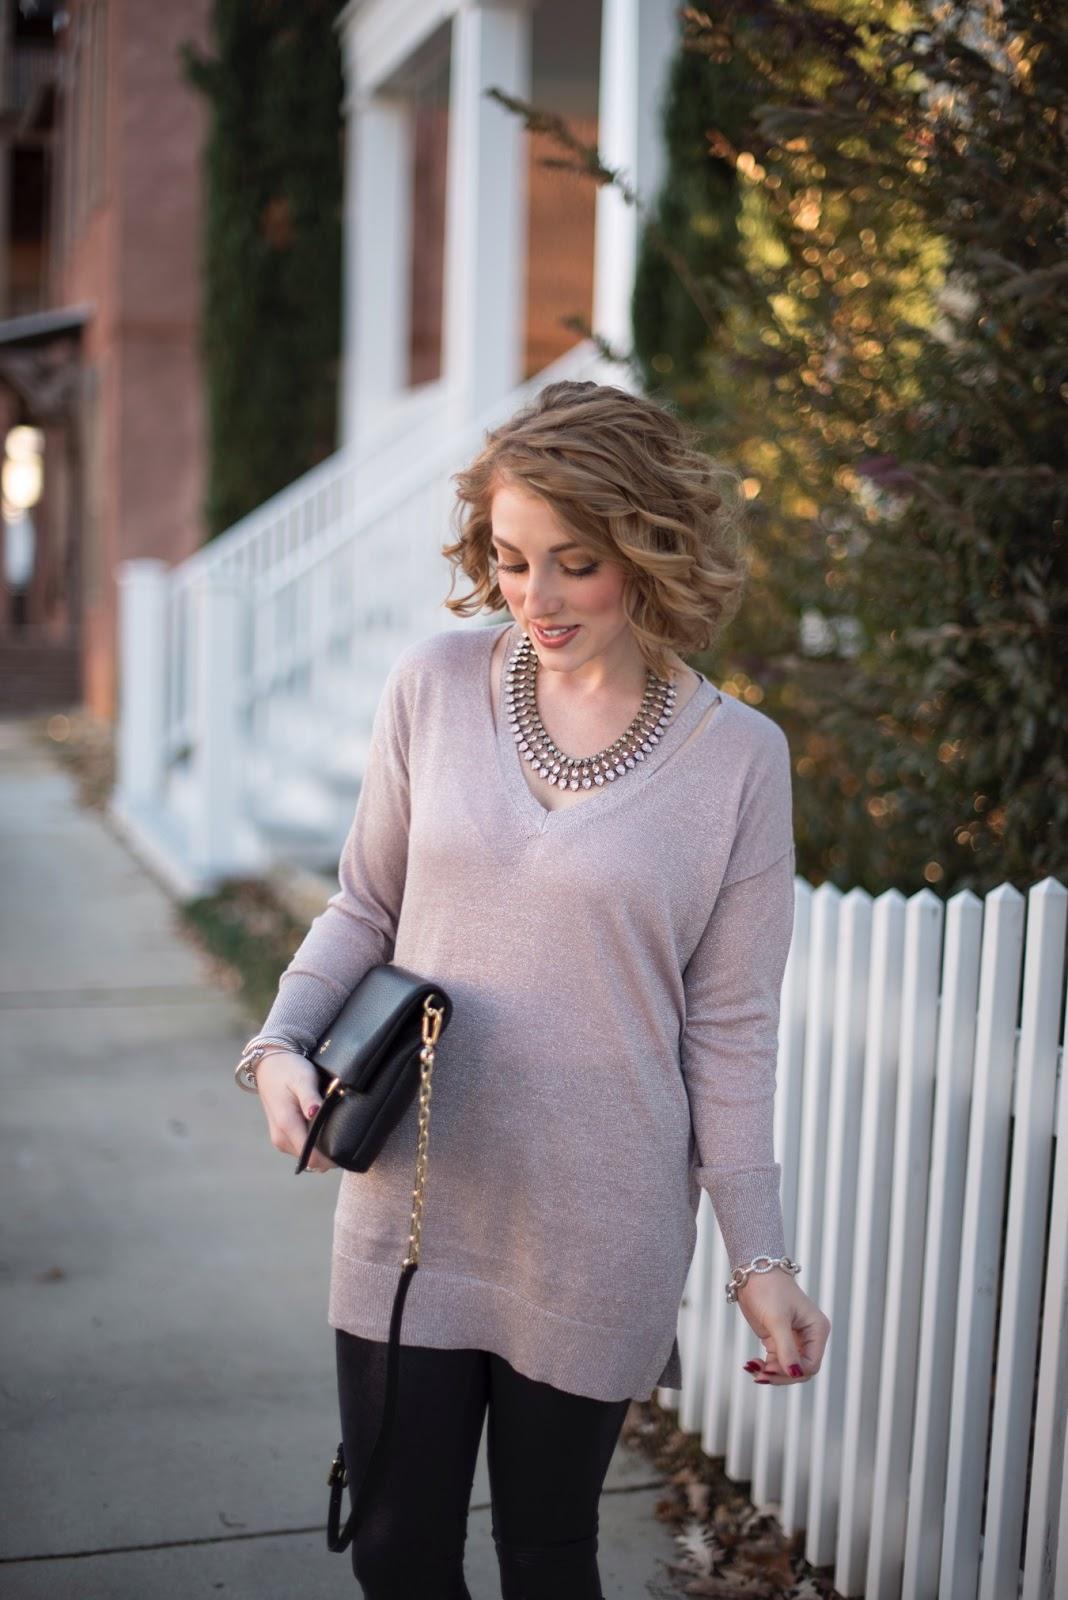 Metallic Sweater - Something Delightful Blog